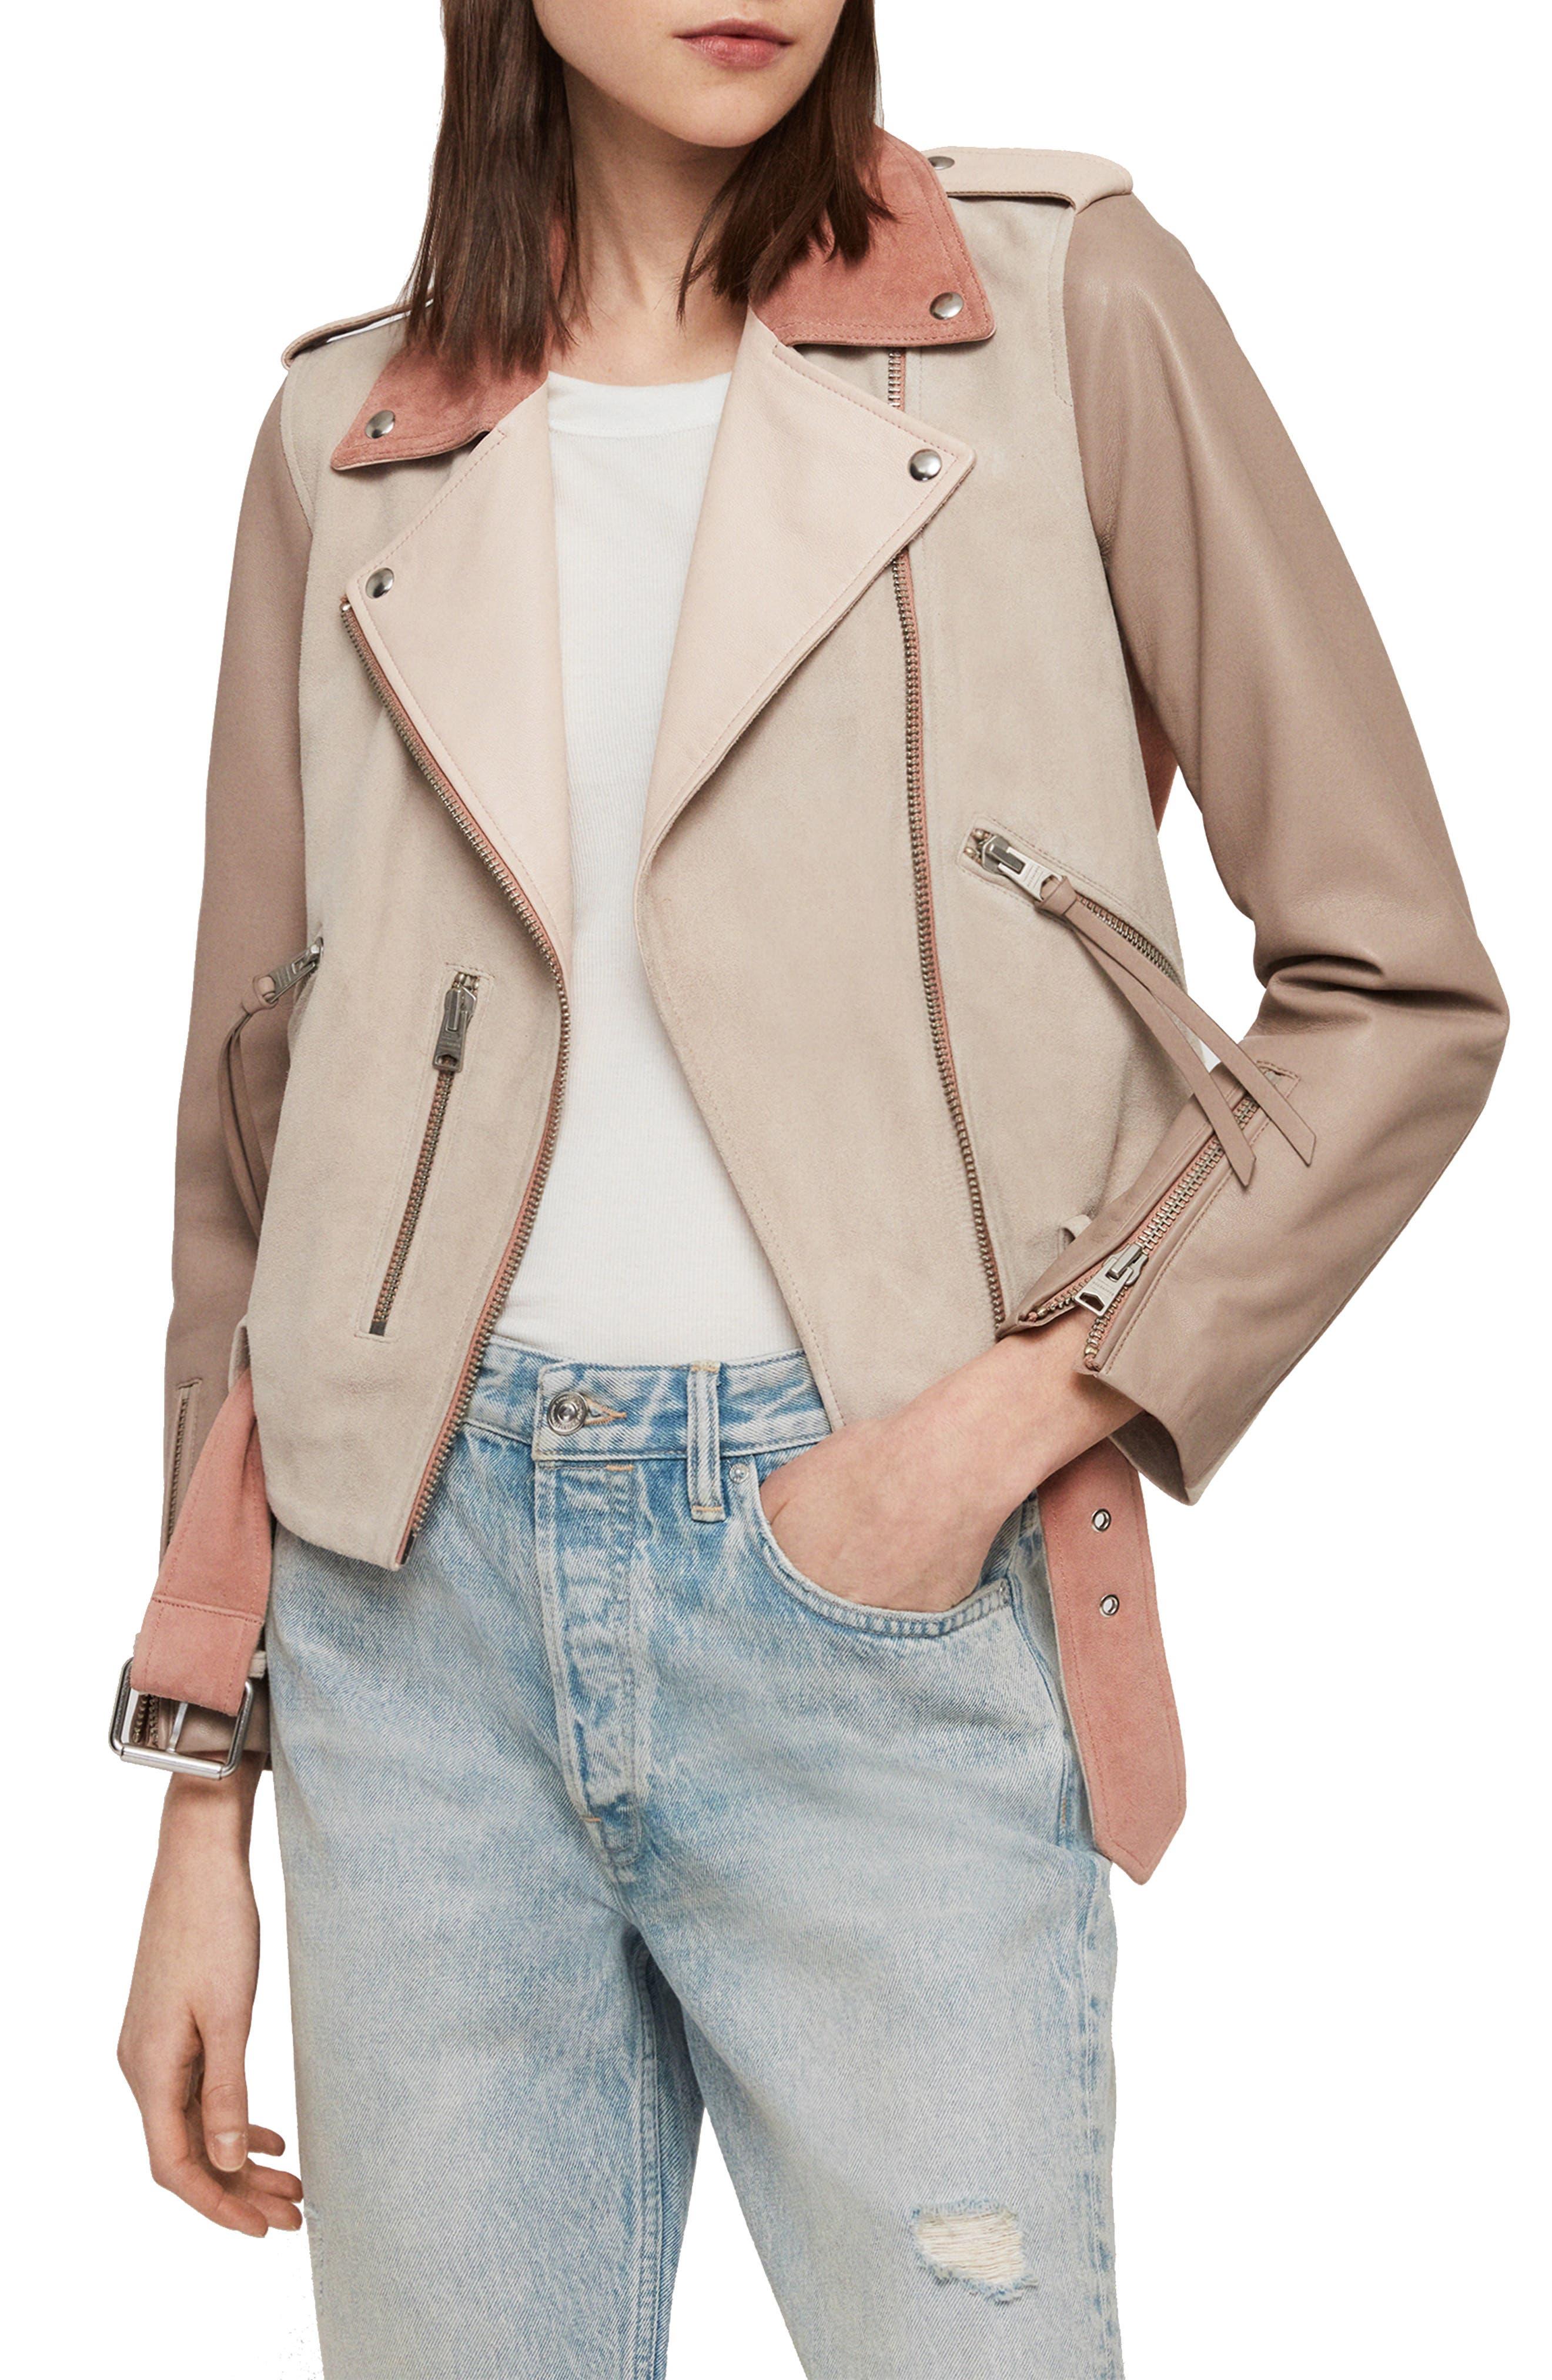 Balfern Mix Suede & Leather Biker Jacket, Main, color, PINK MIX